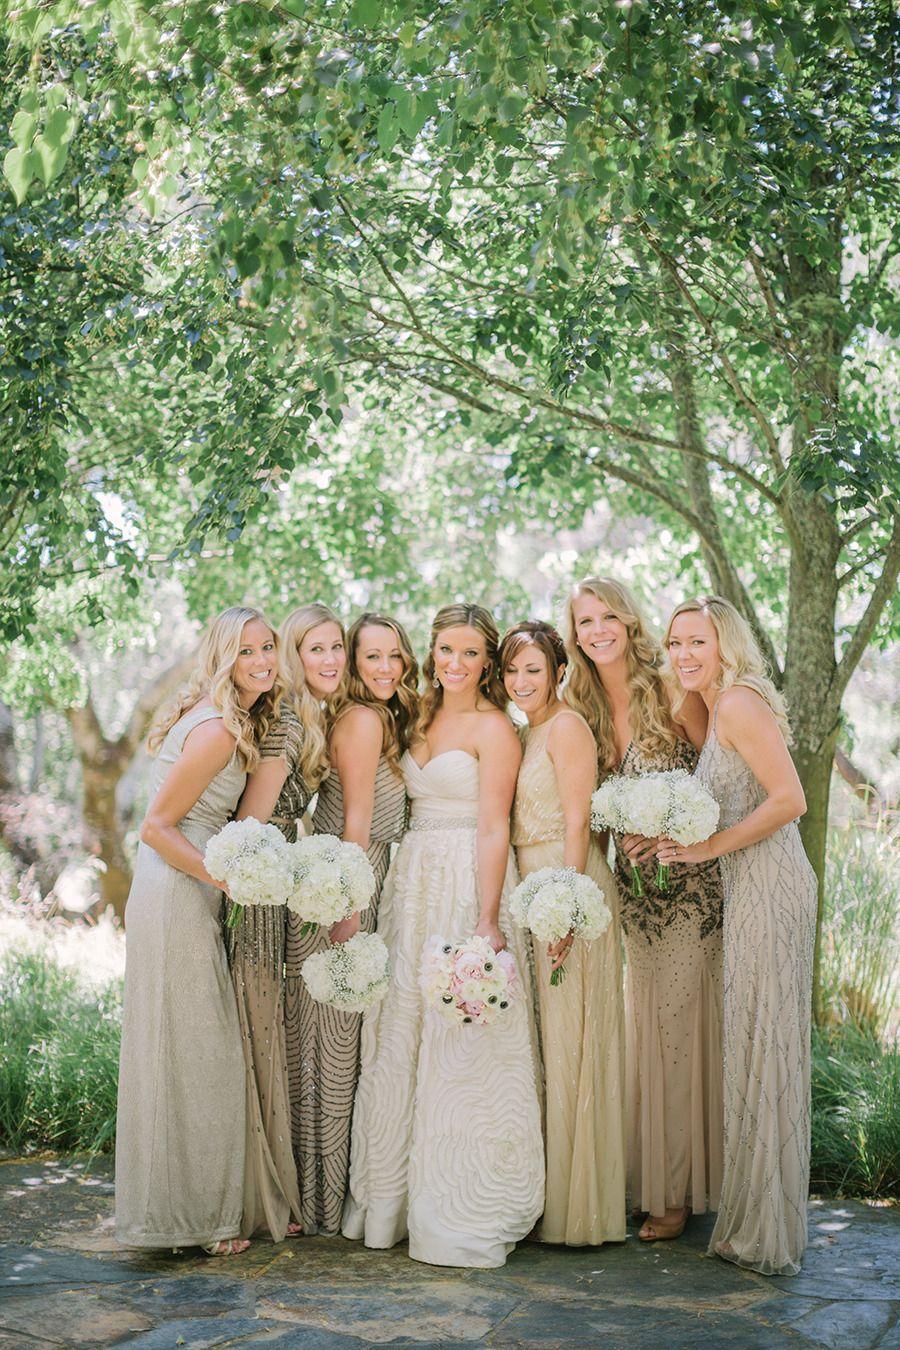 Rustic Chic Chalk Hill Winery Wedding Beige Bridesmaid Dress Champagne Champagne Bridesmaid Dresses Metallic Bridesmaid Dresses